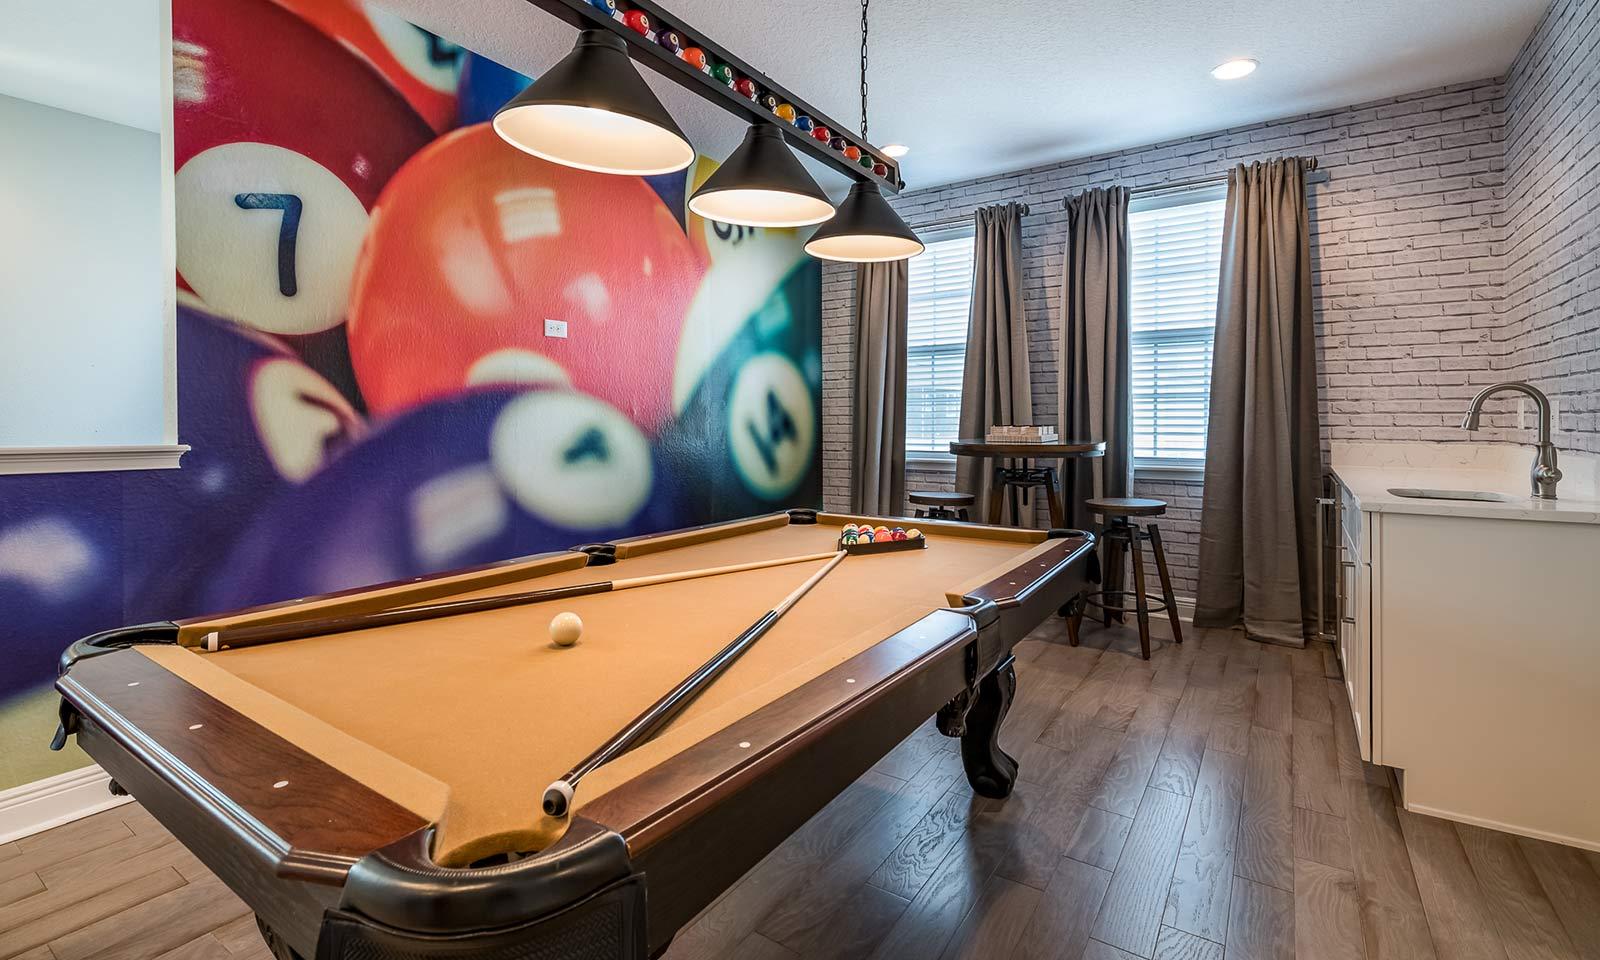 [amenities:pool-table:2] Pool Table